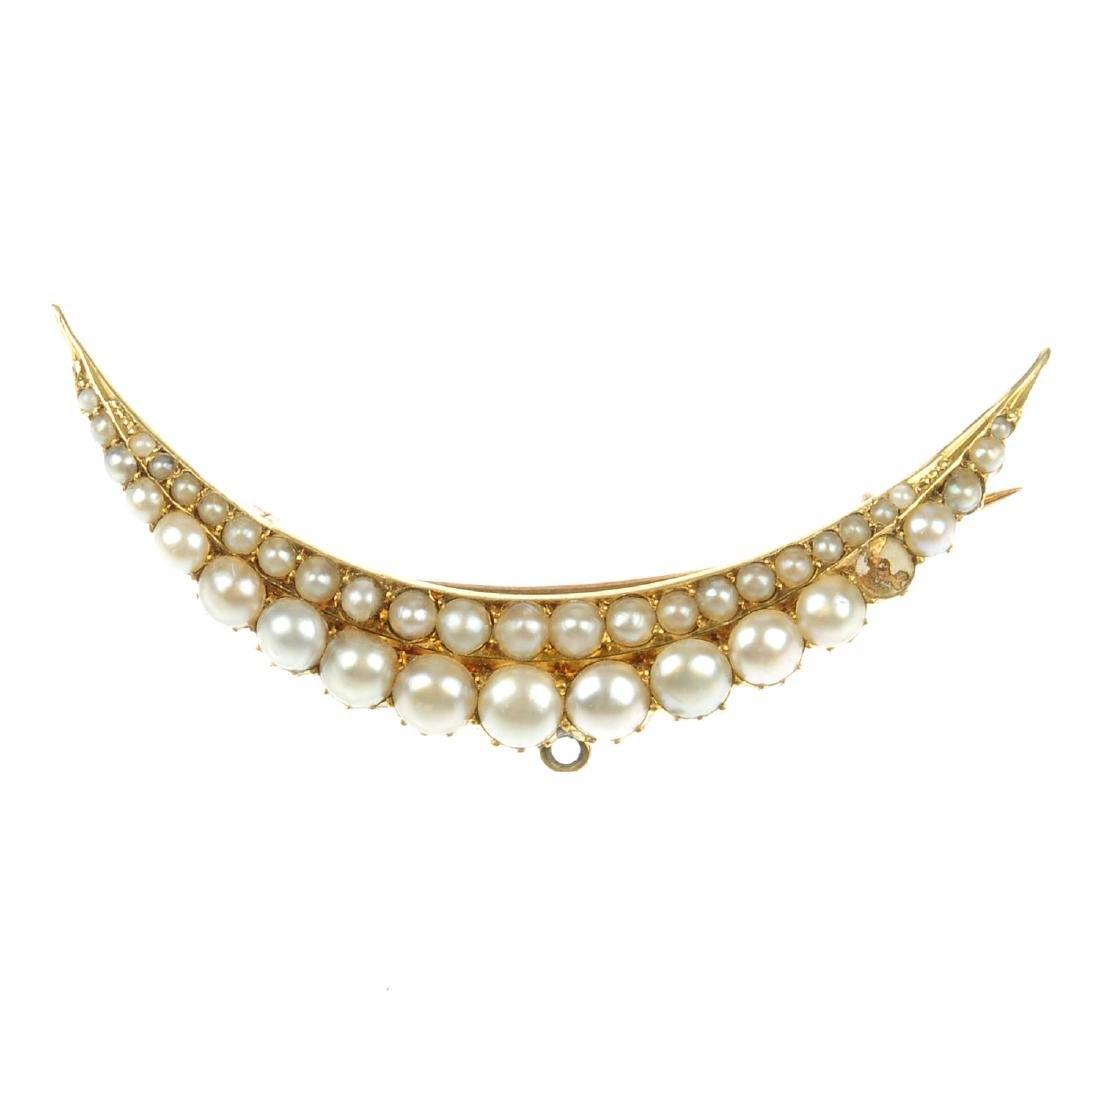 A split pearl brooch. Of crescent shape, designed as